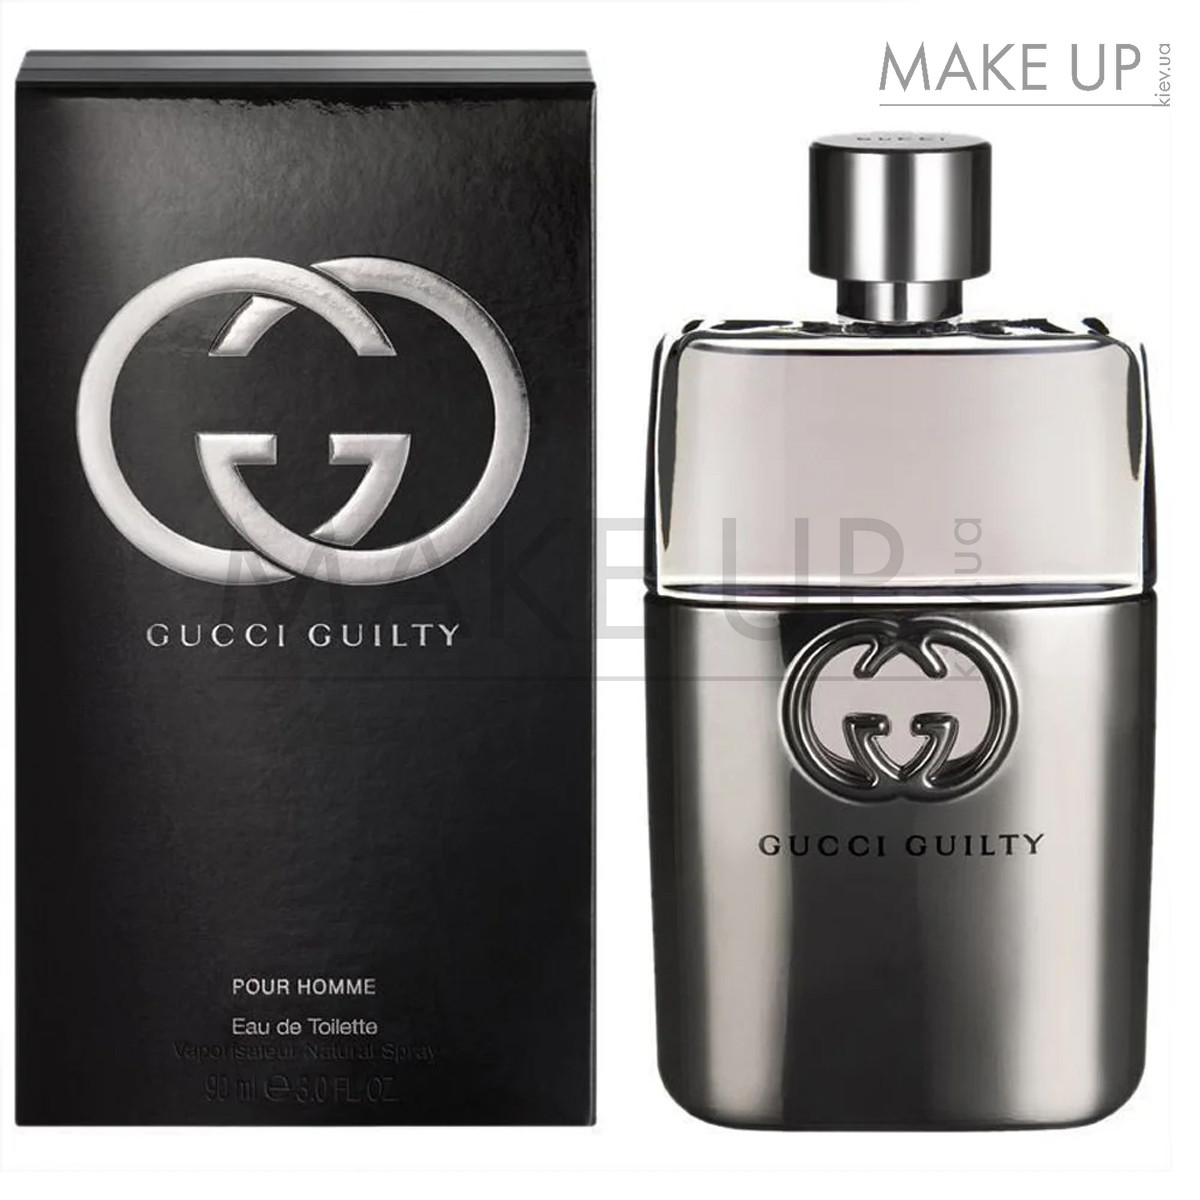 Мужская туалетная вода Gucci Guilty Pour Homme EDT 90 мл.   Лицензия Объединённые  Арабские Эмираты